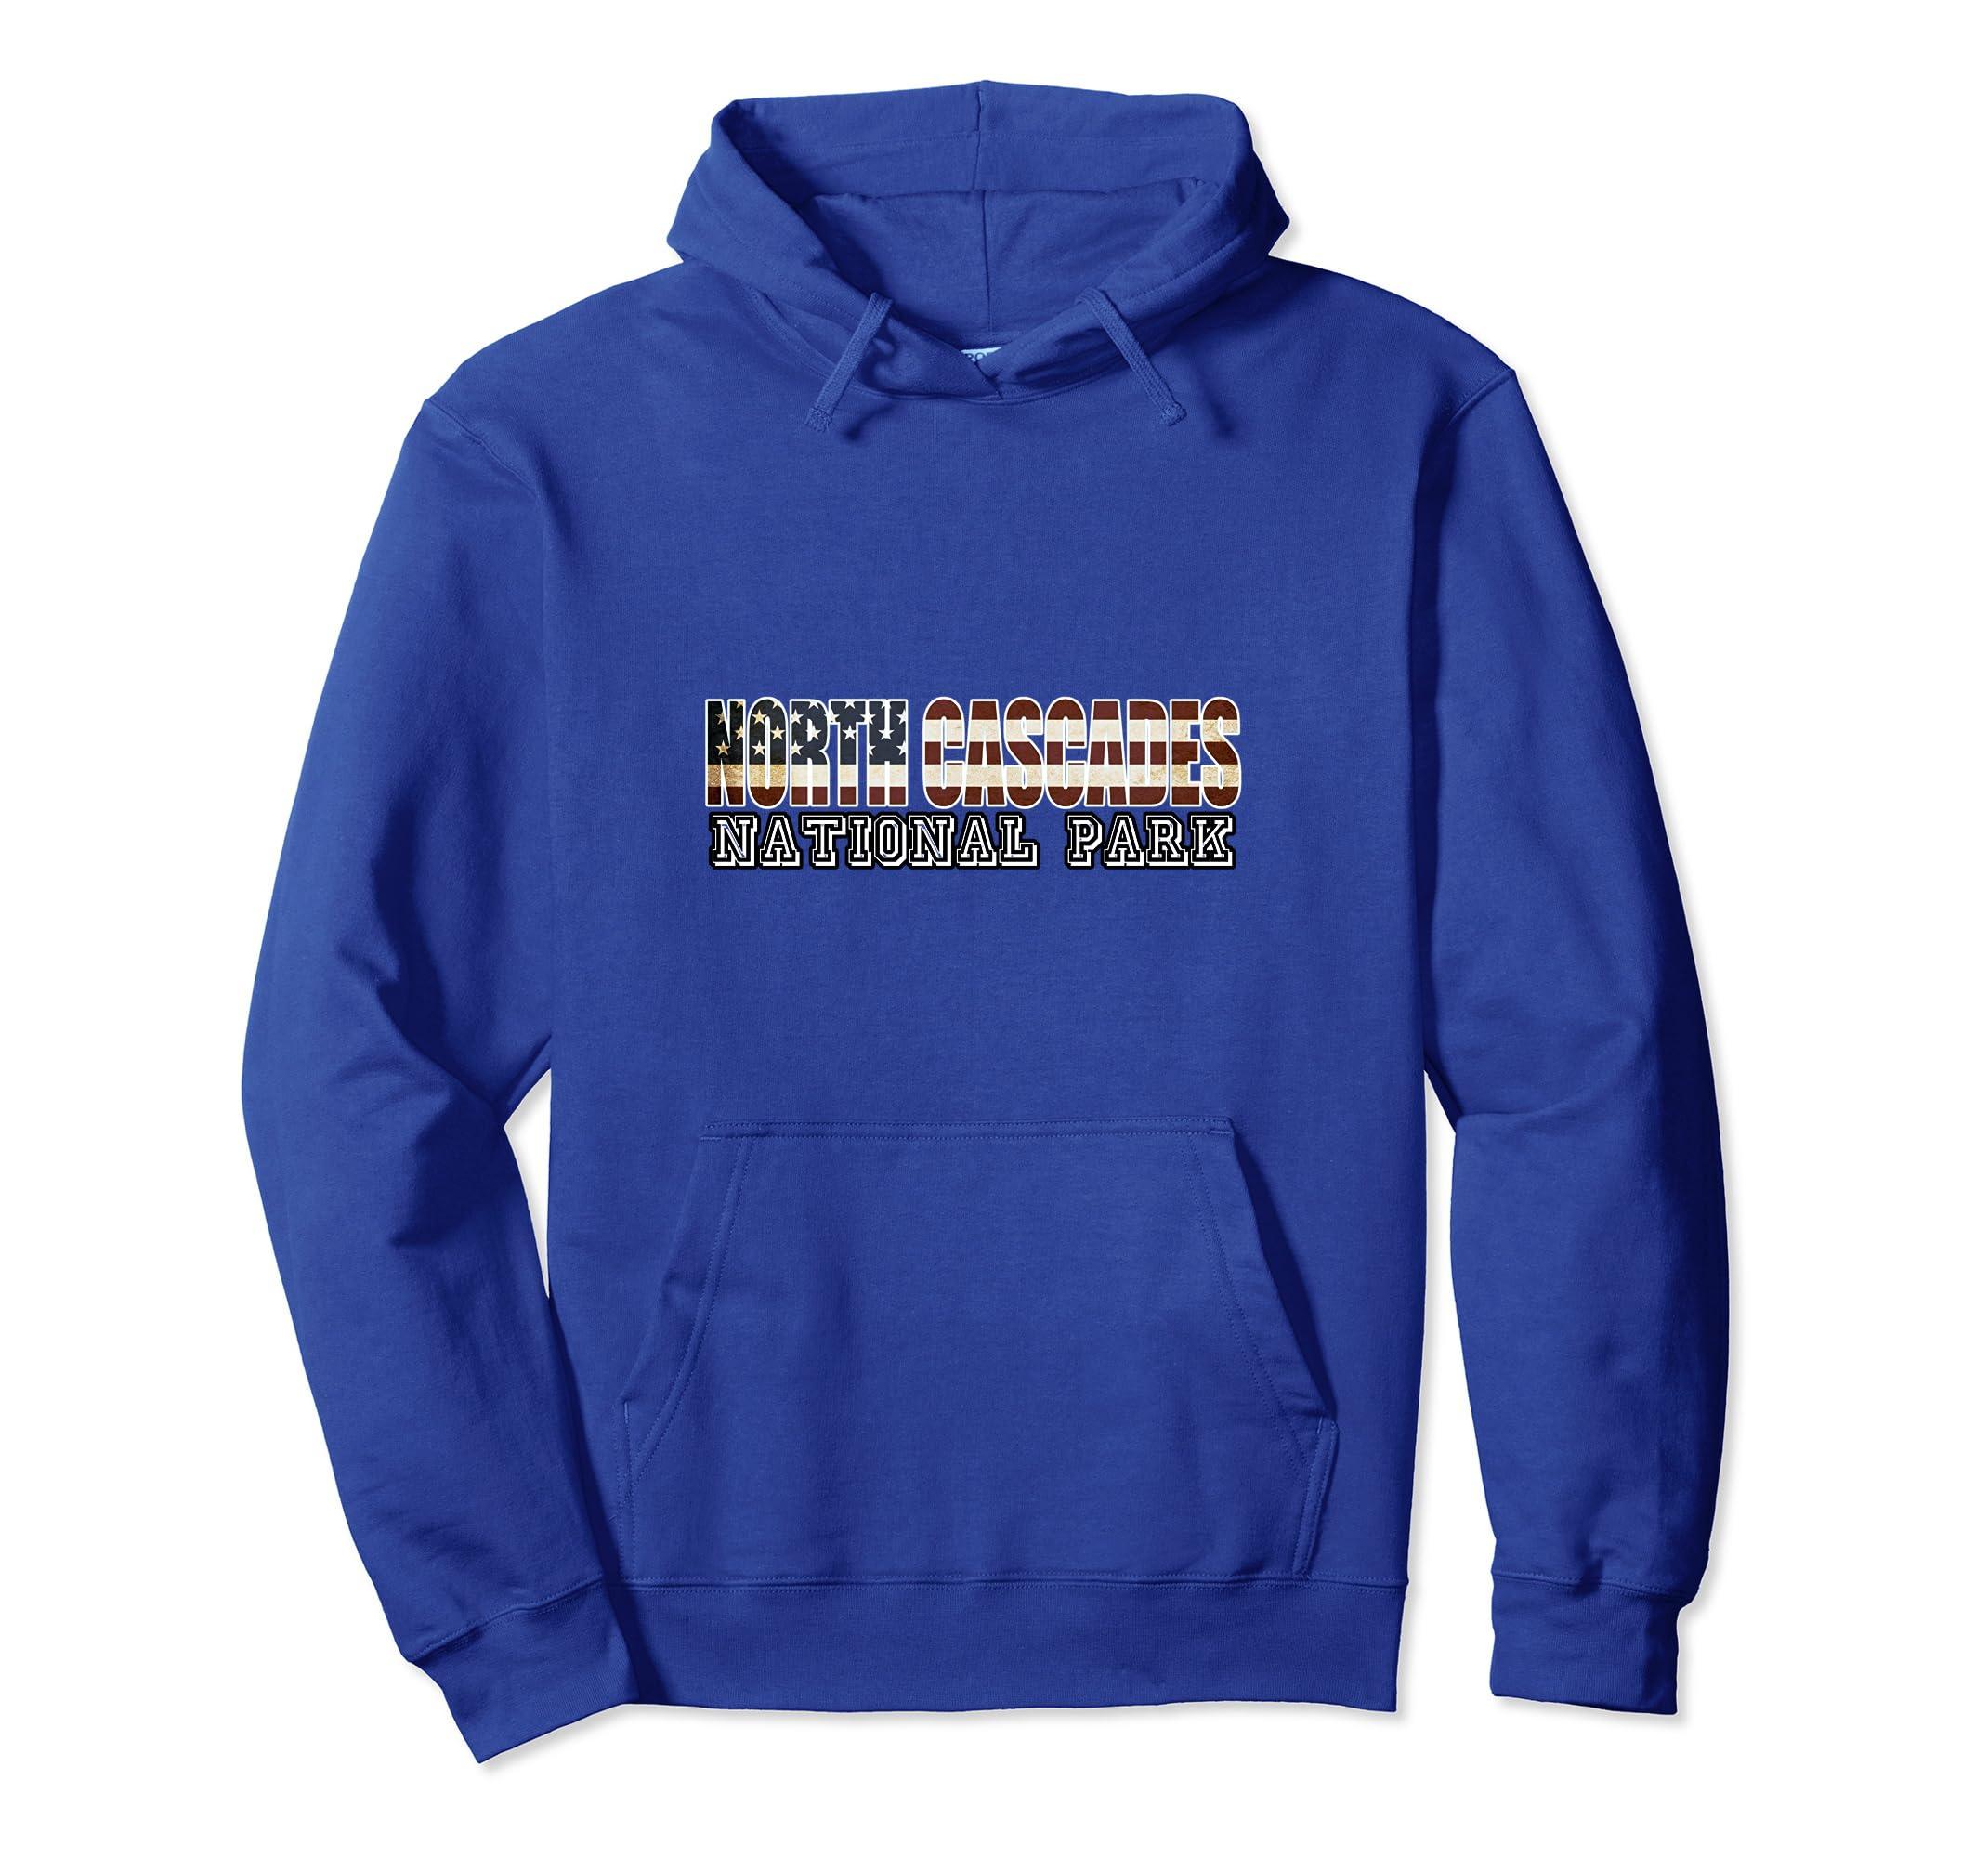 North Cascades National Park US Flag Patriotic Hoodie-Colonhue